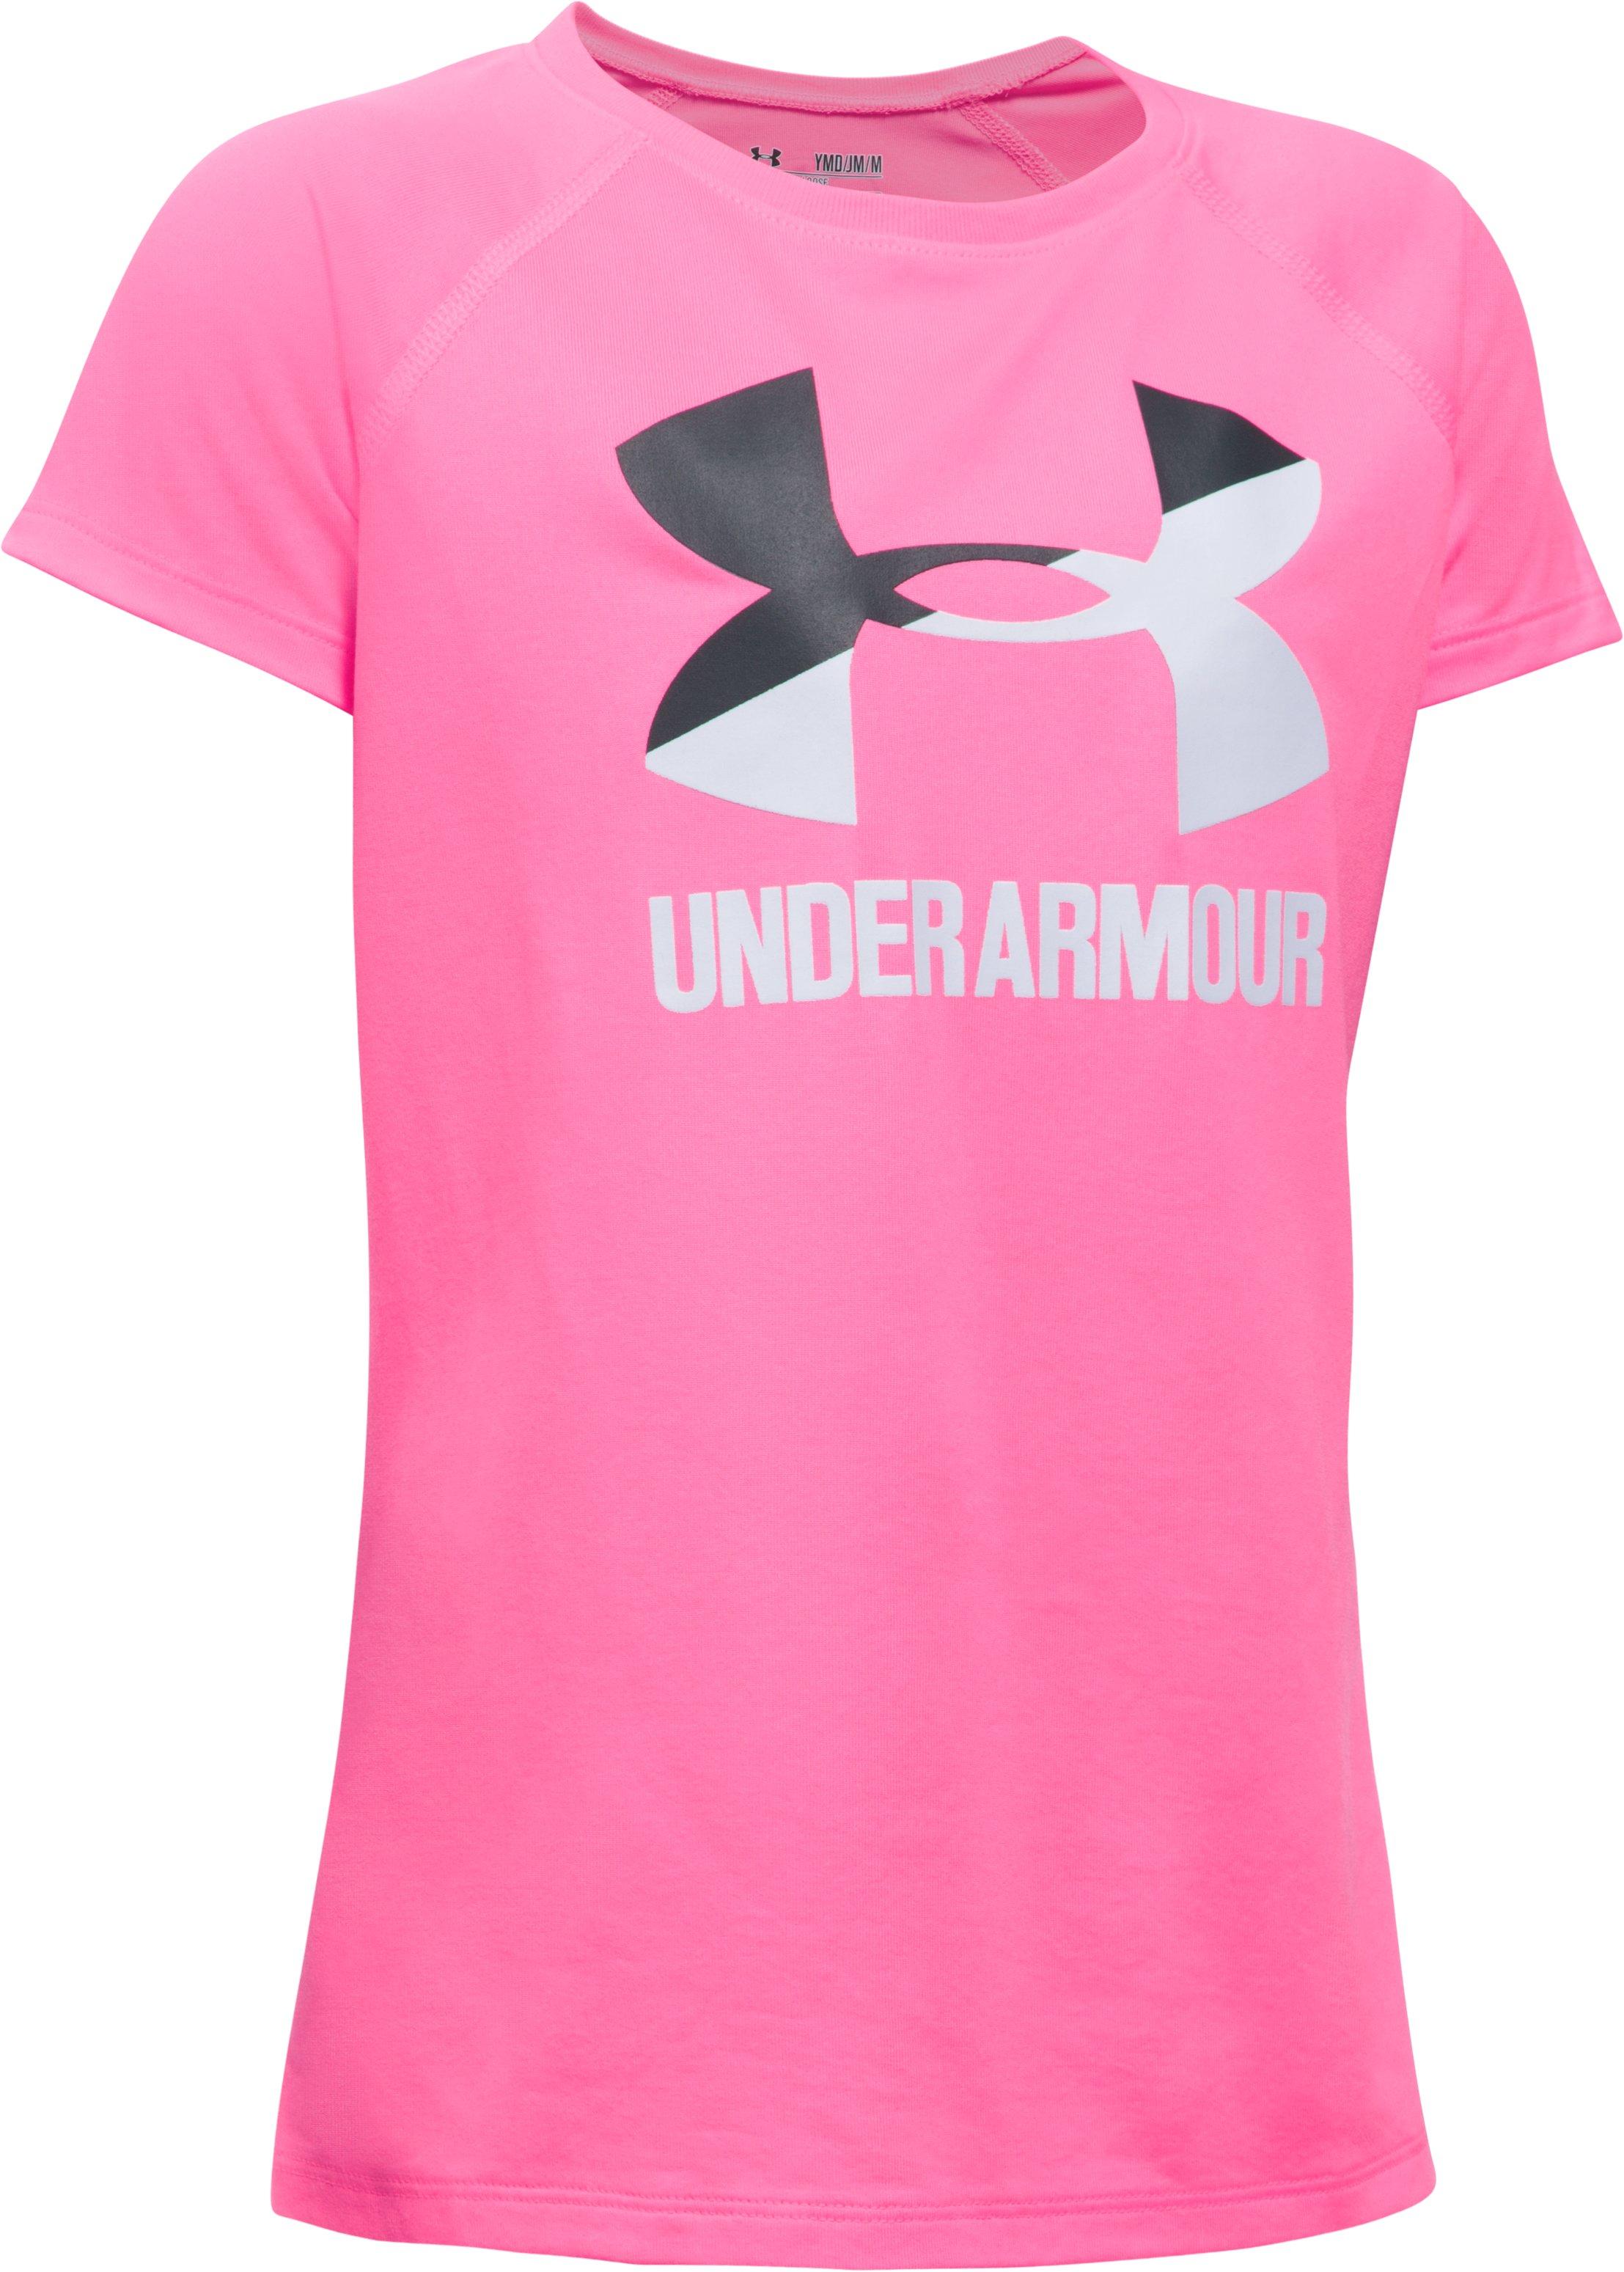 Girls' UA Solid Big Logo Short Sleeve T-Shirt | Under Armour EG